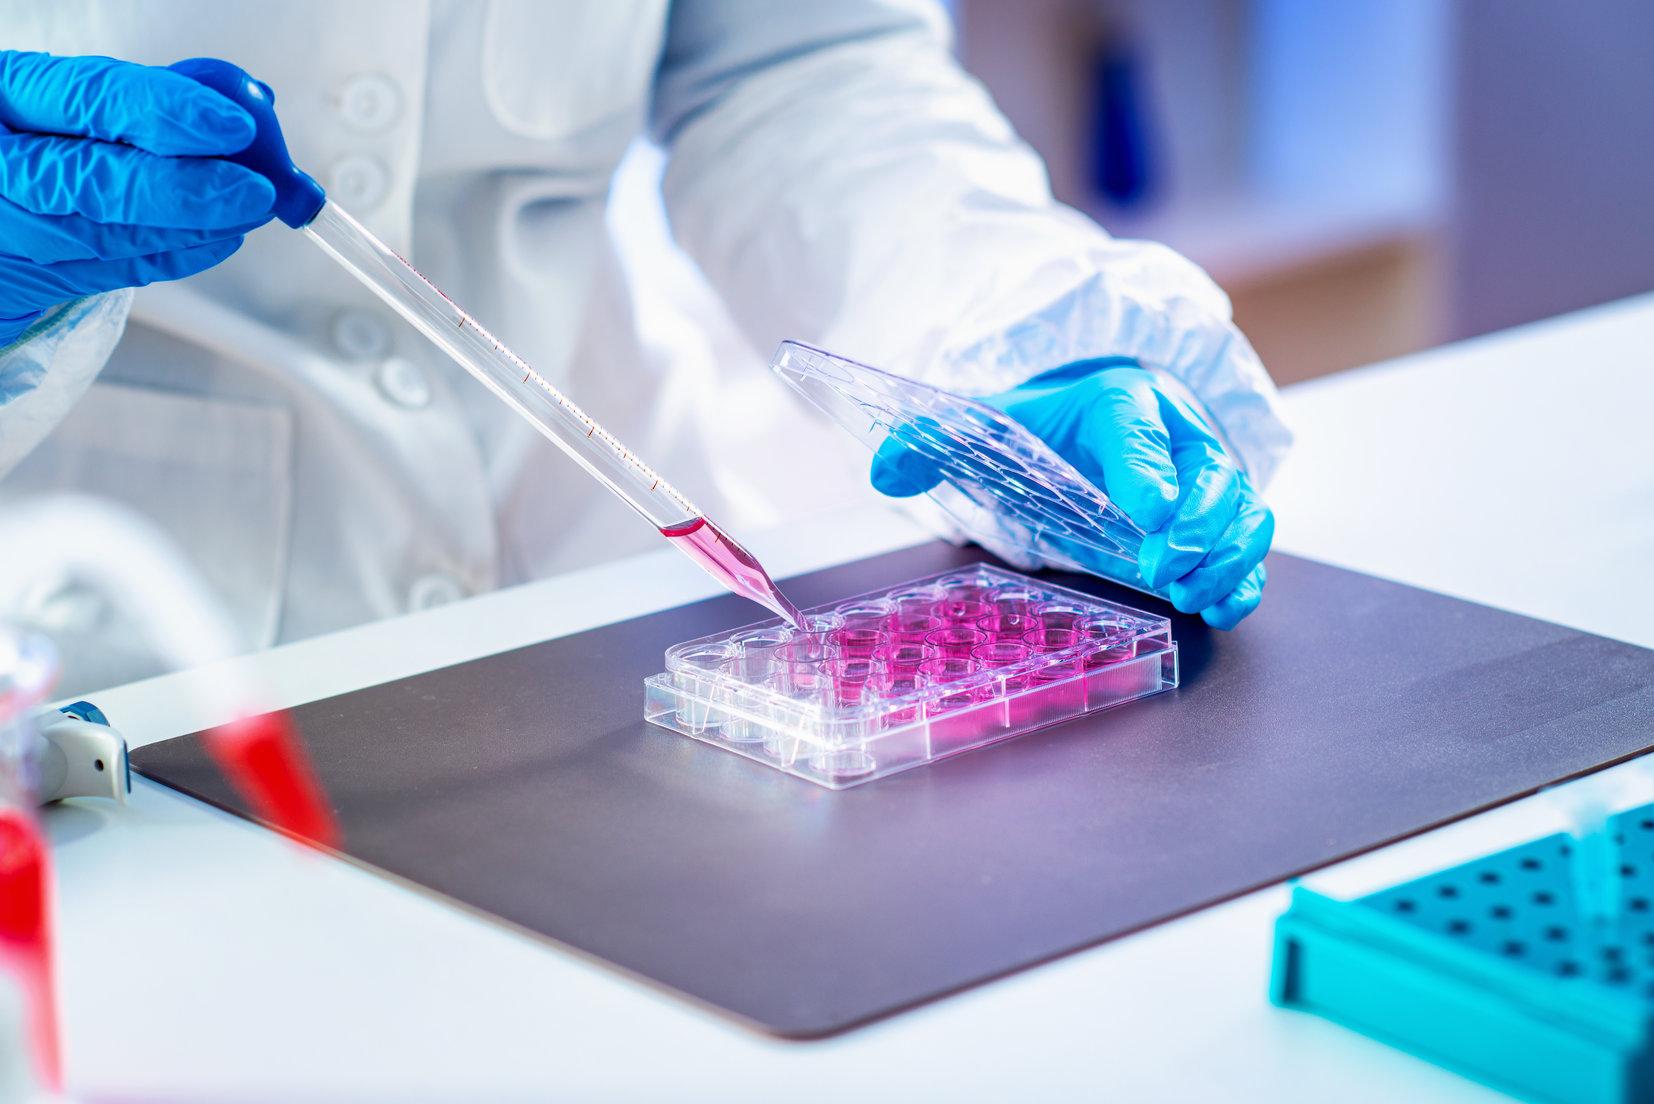 Viscosity of Fetal Bovine Serum and Media Formulations